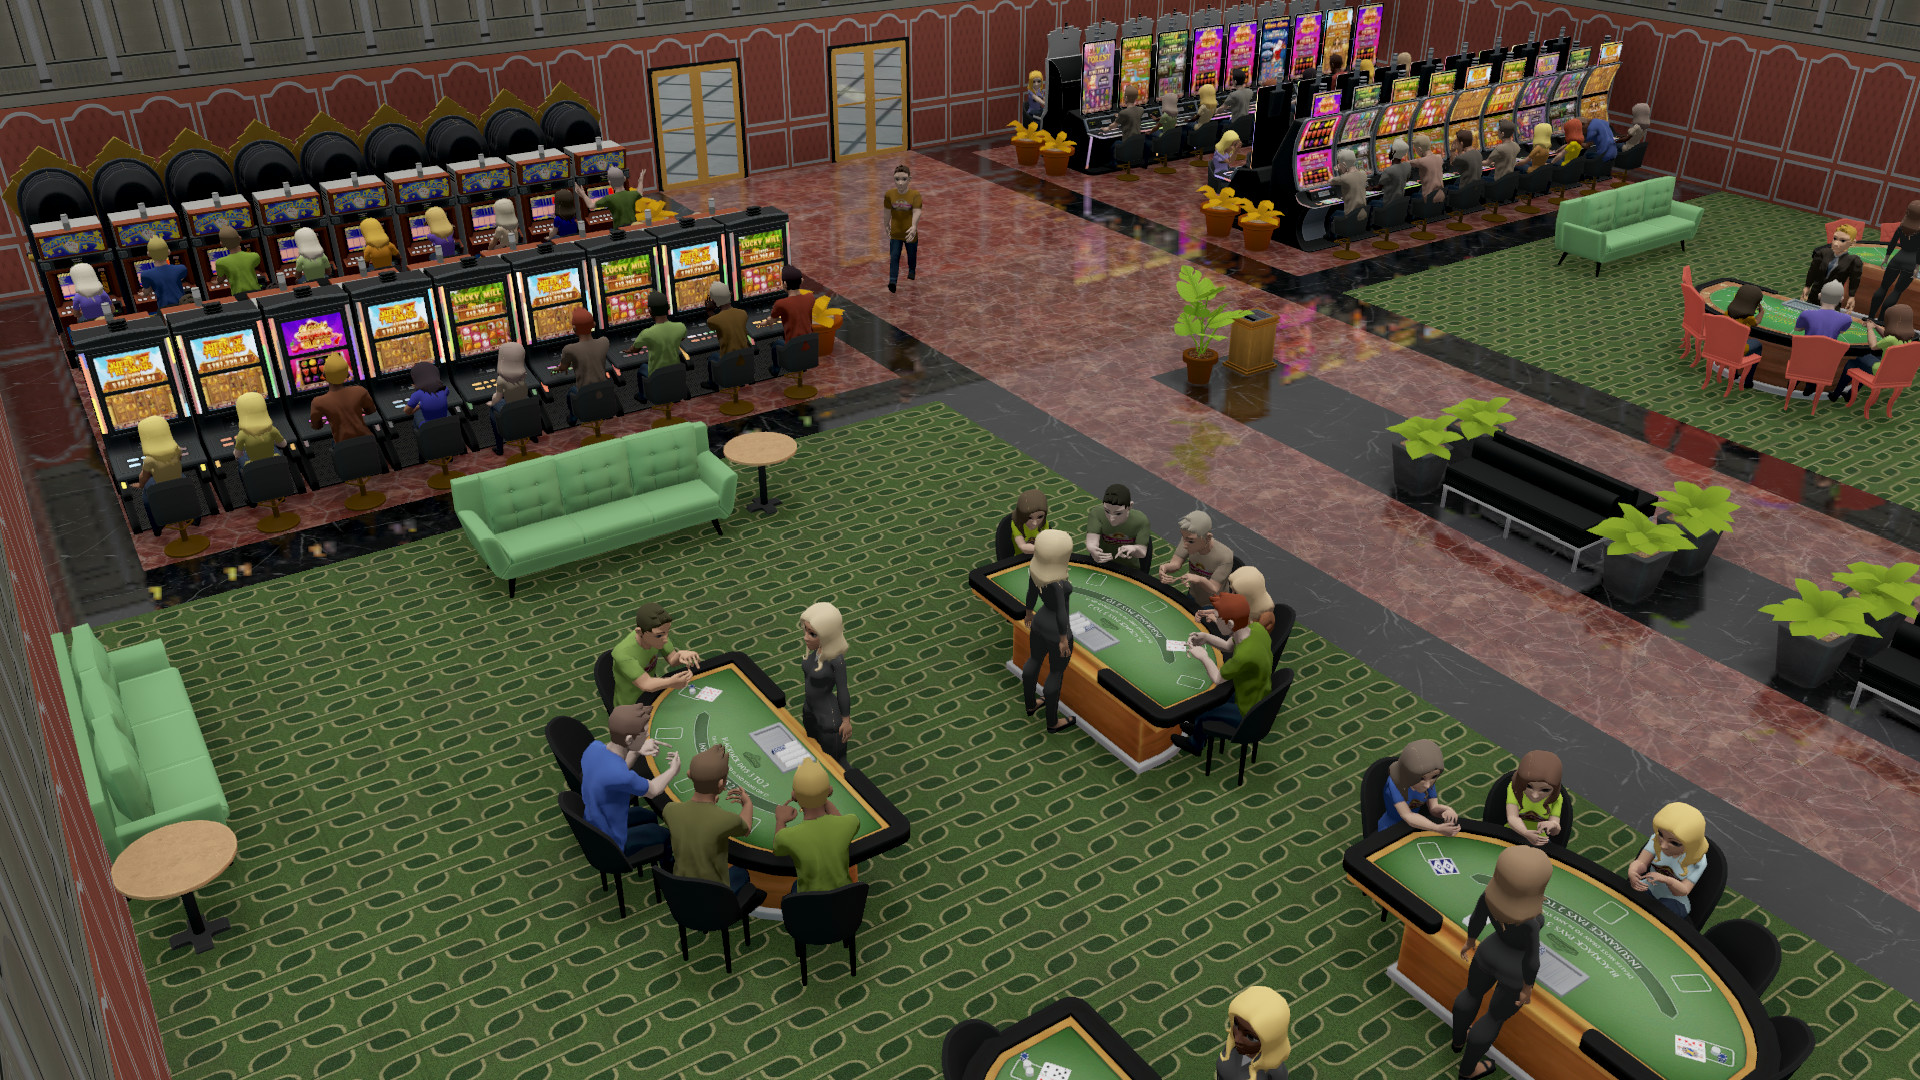 Sim casino games grosvenor casino hanley phone number